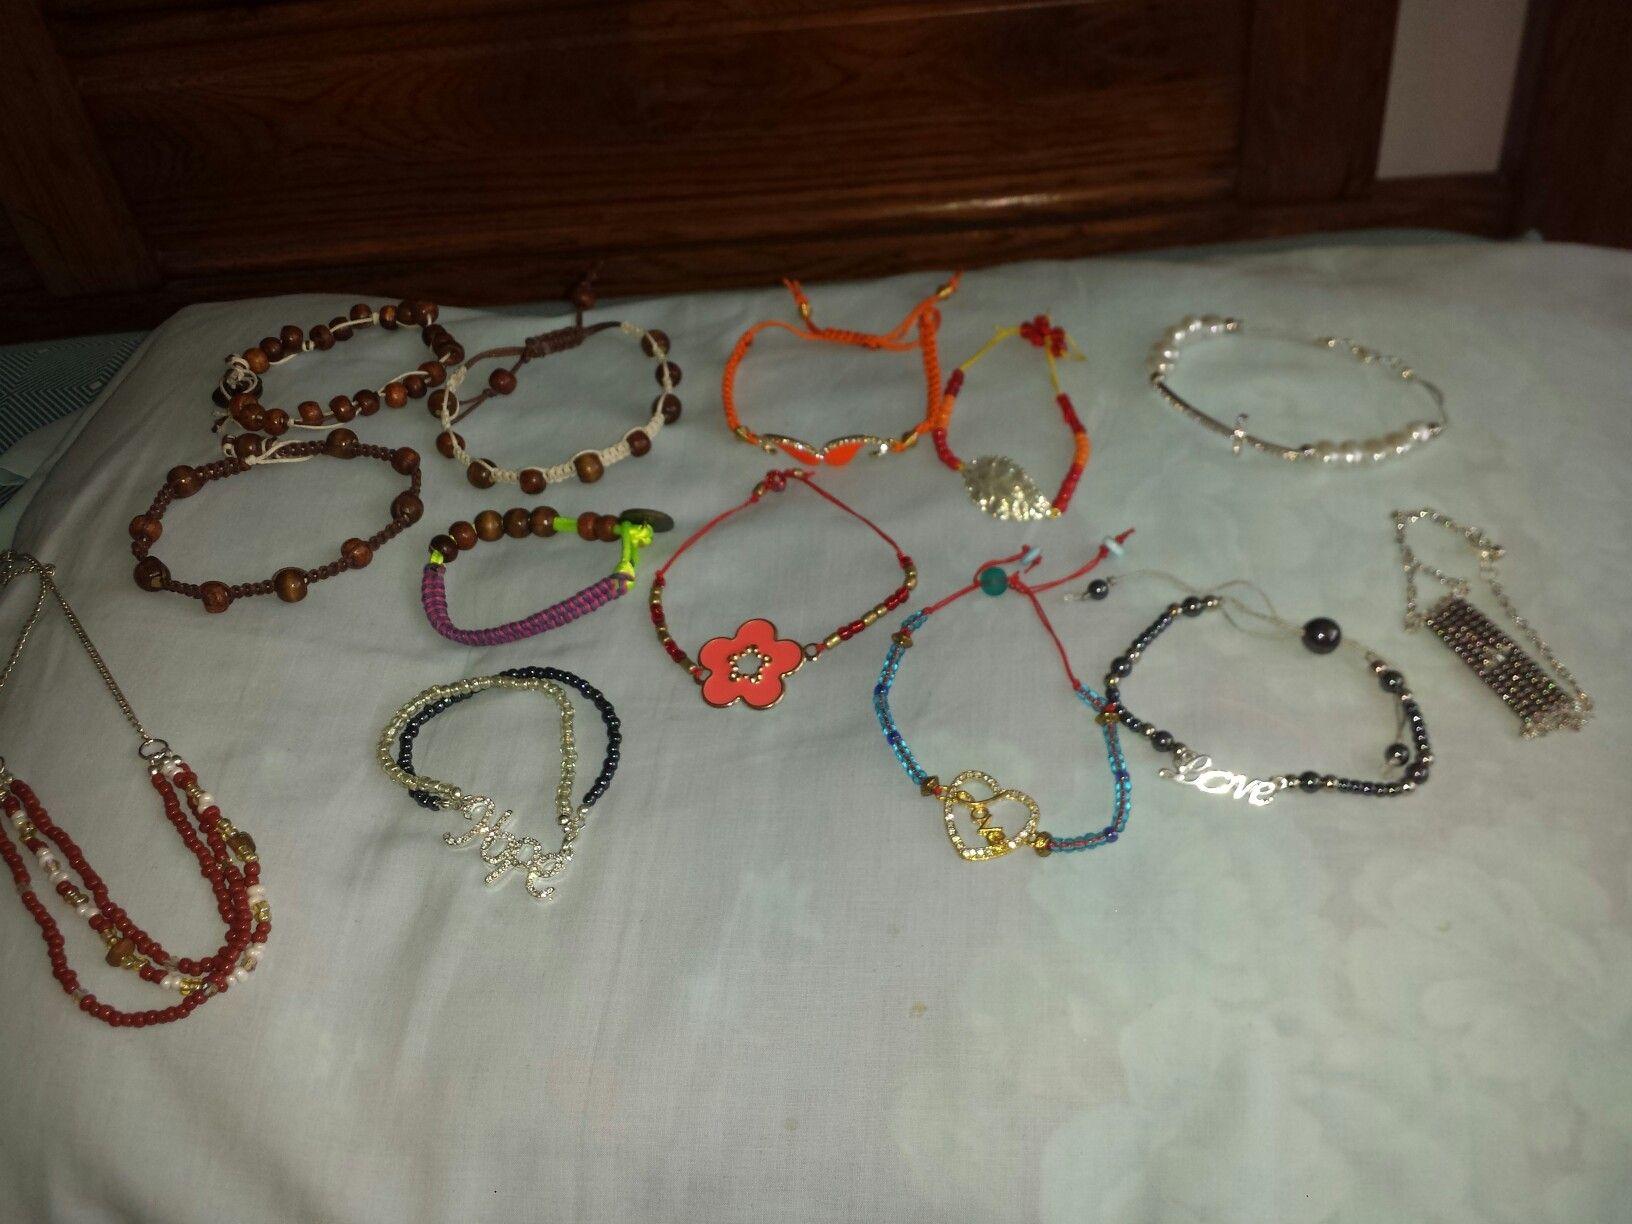 Mens shambala wood bracelets and women charm bracelets made of glass beads.. necklace of glass beads twistable...I love creating.